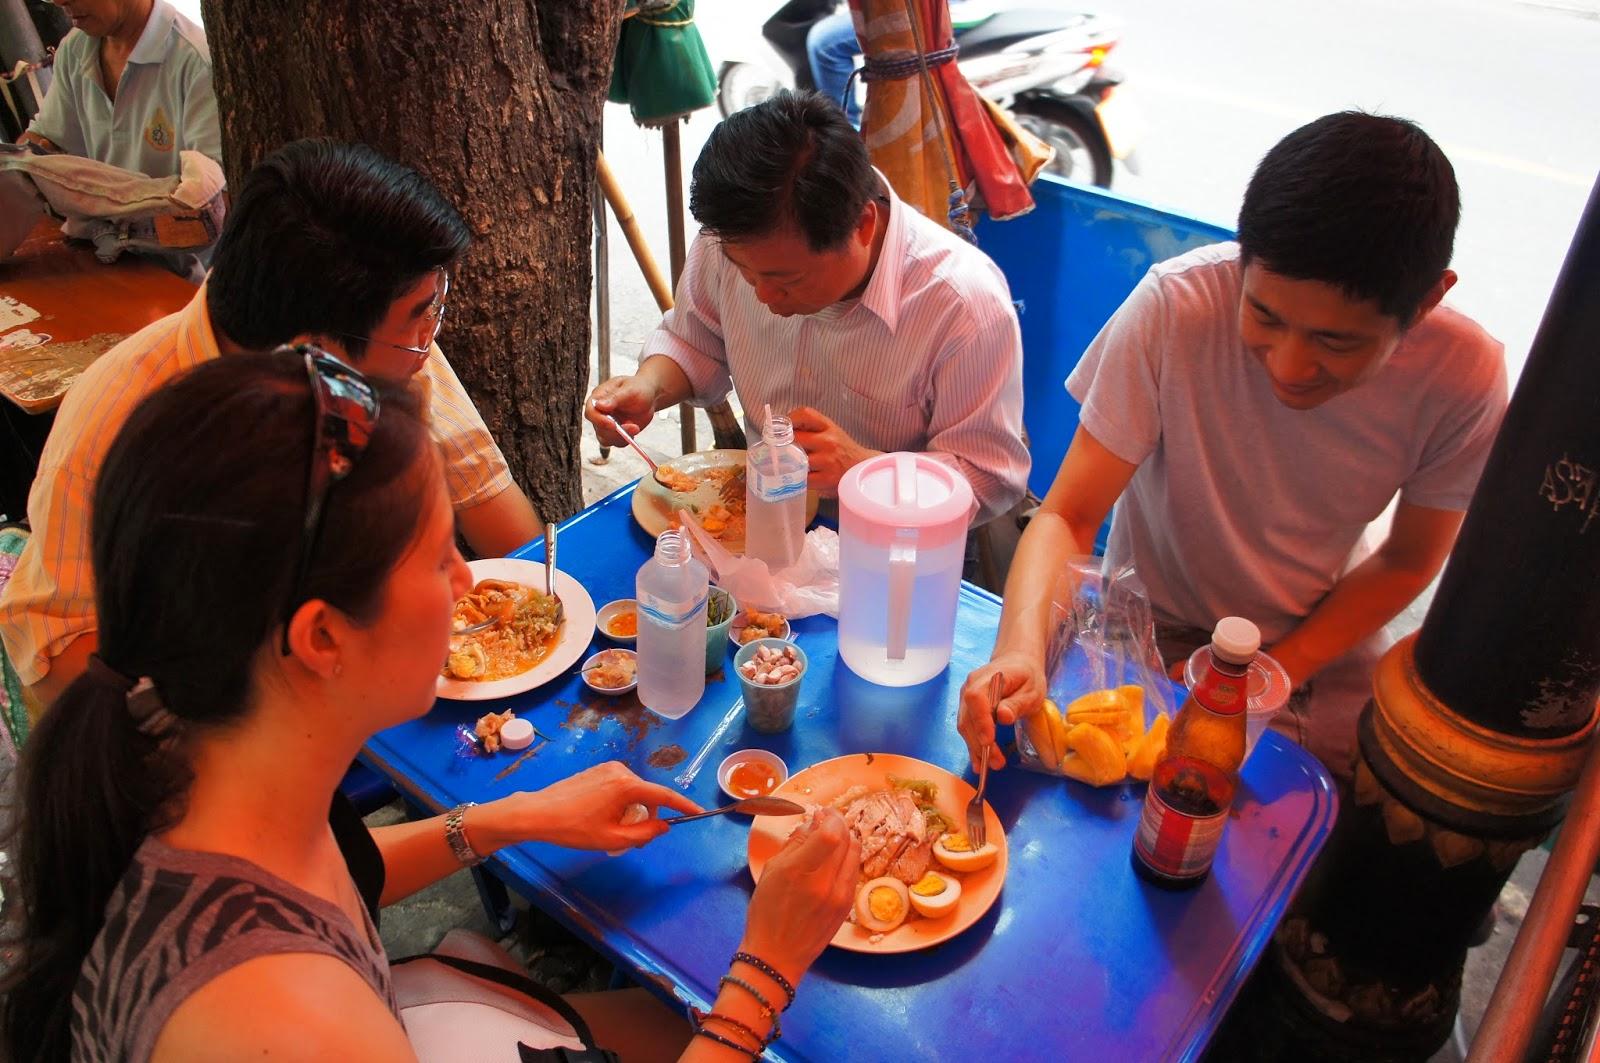 Bangkok - Time to enjoy some pork and rice